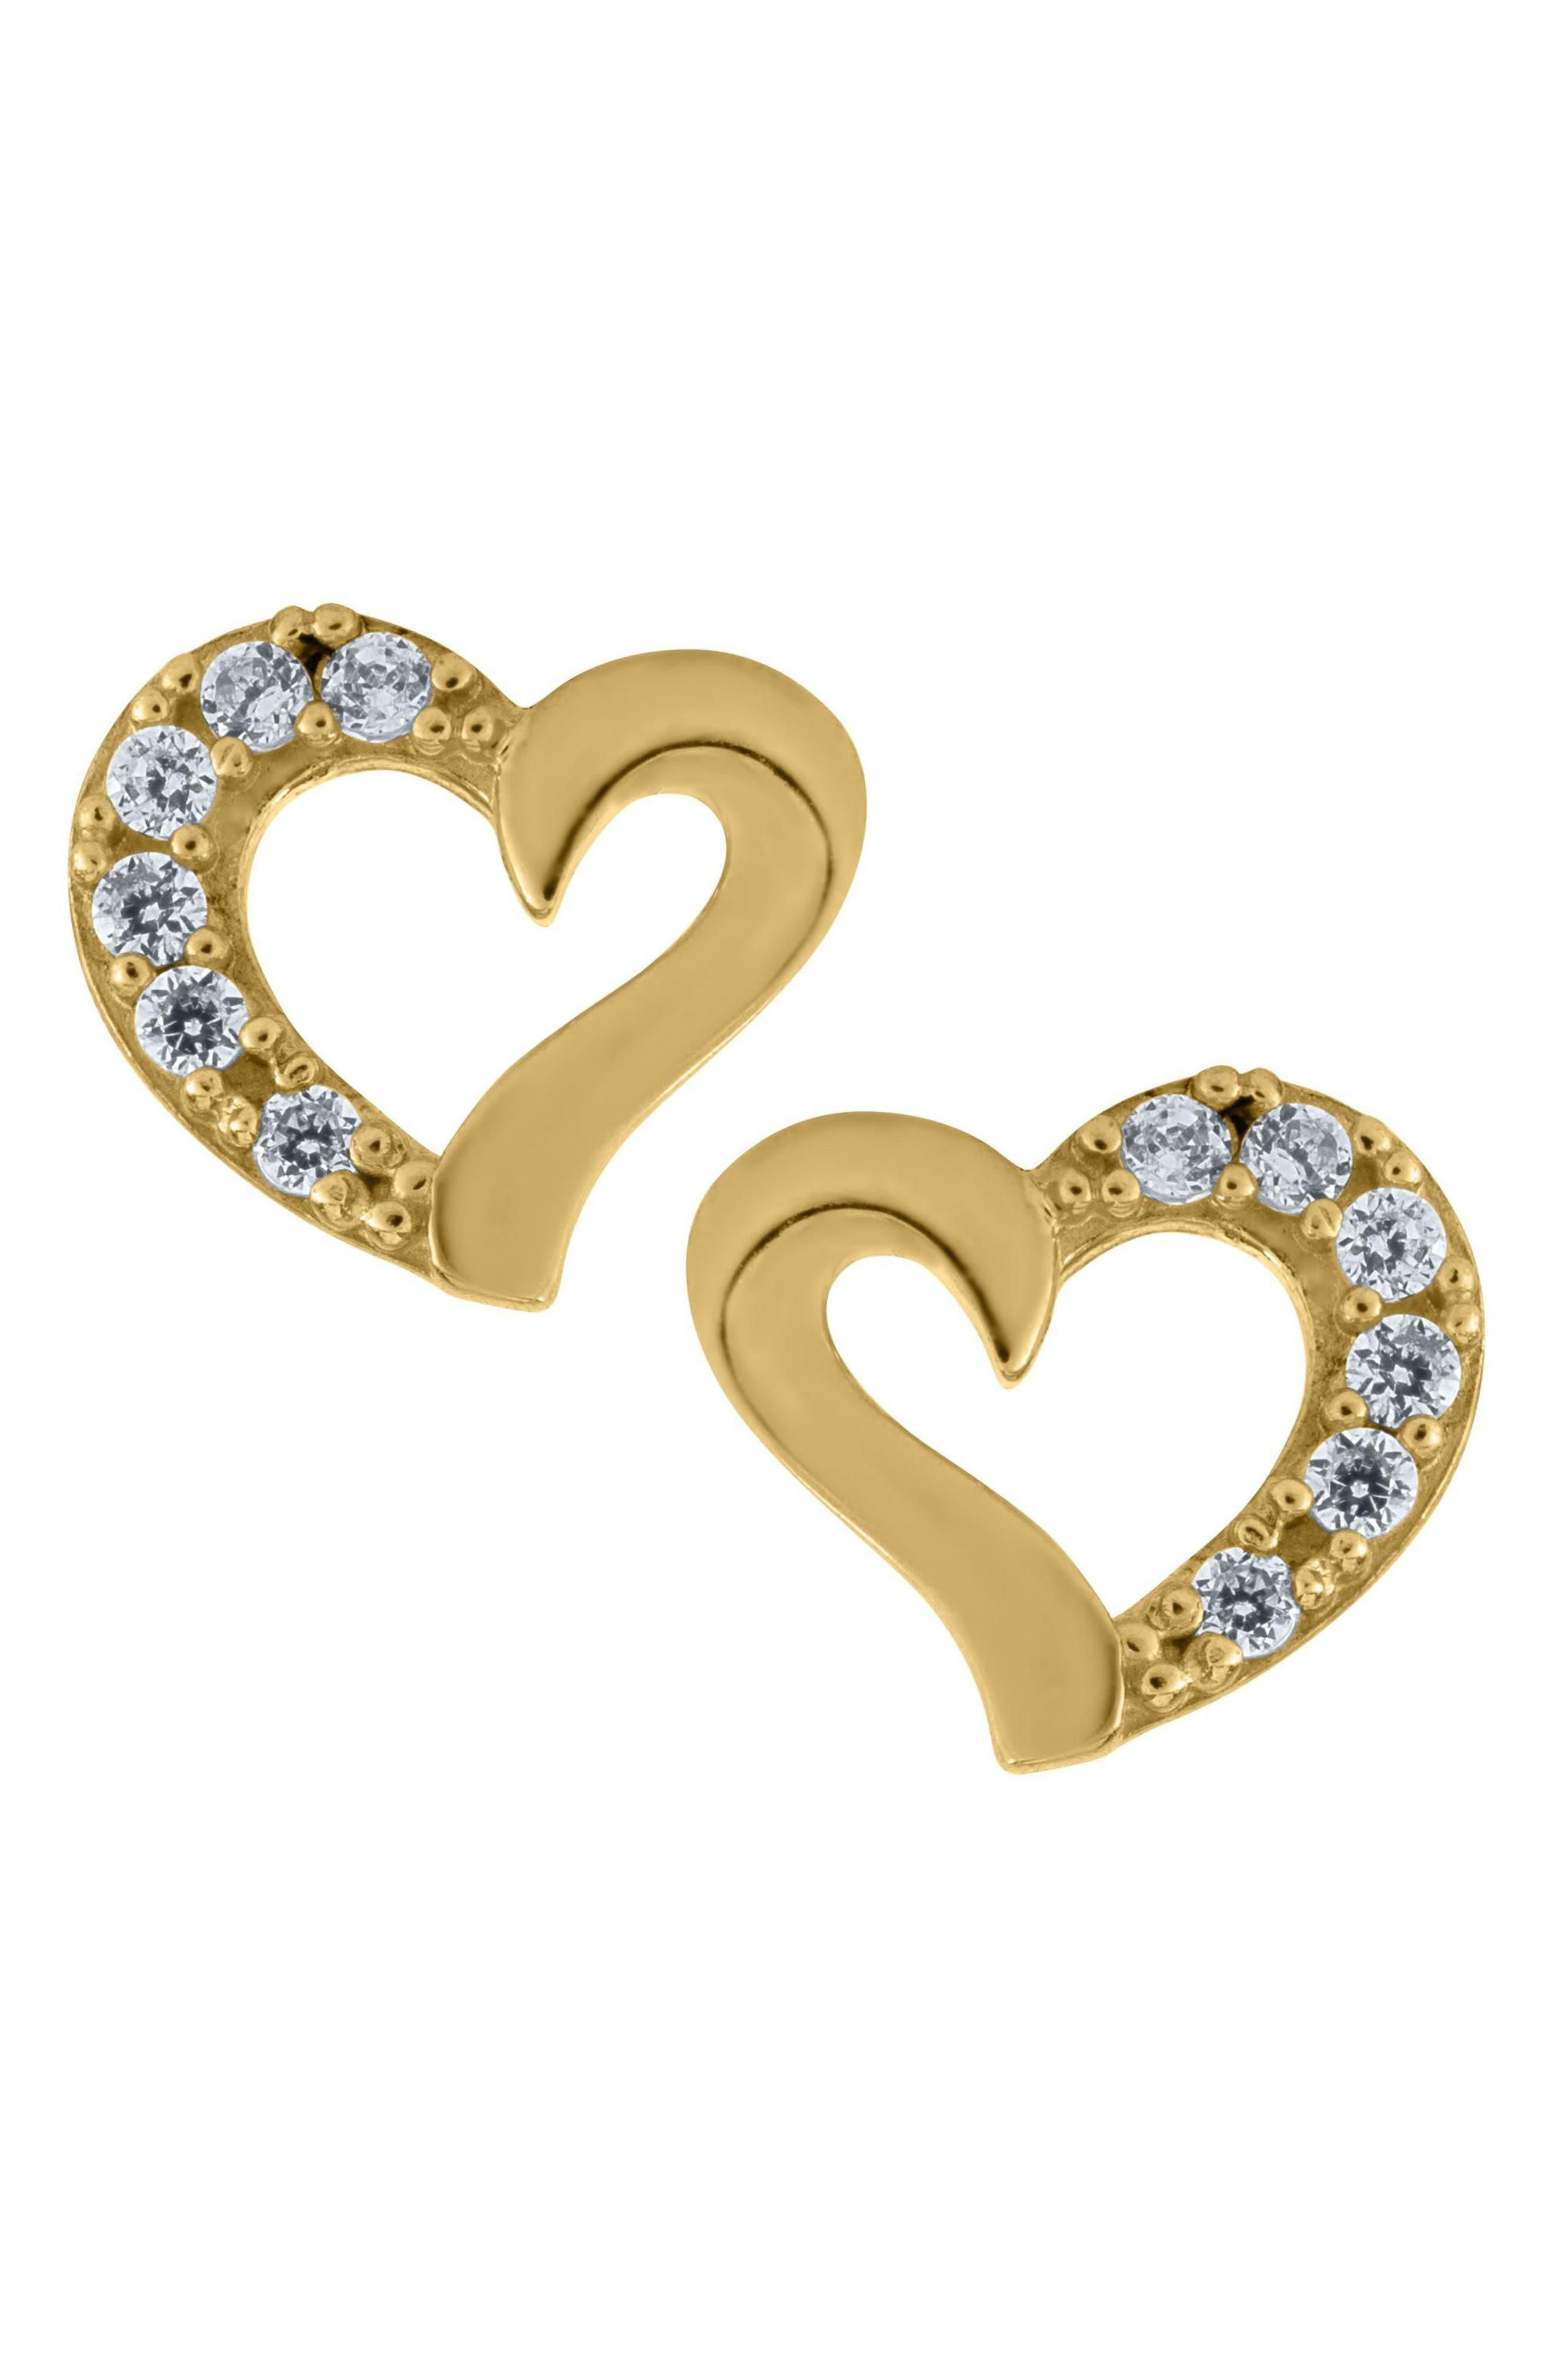 14k Gold Heart Earrings,                         Main,                         color, Gold